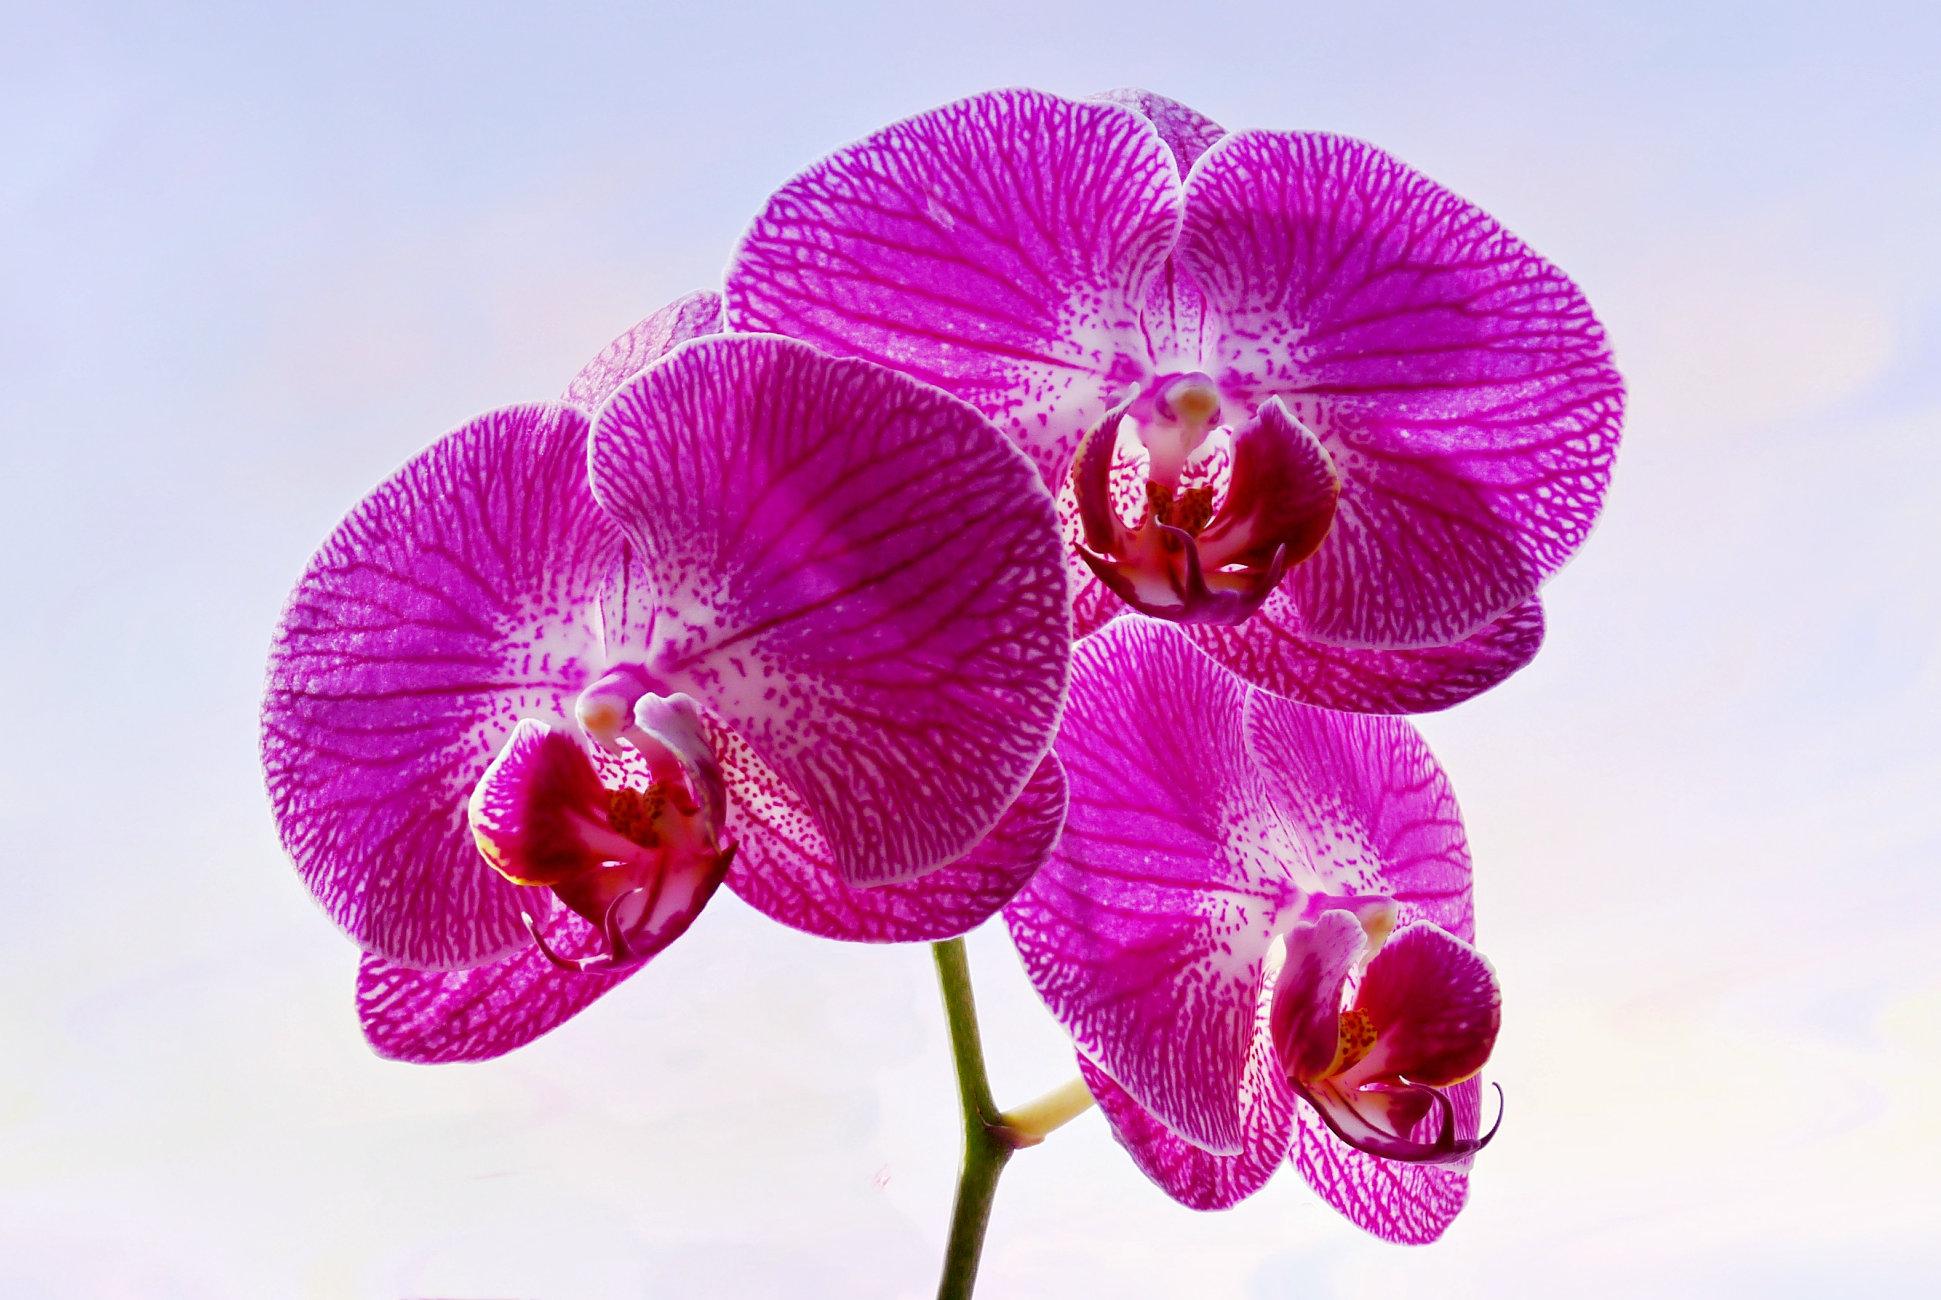 Sunbathing Phalaenopsis